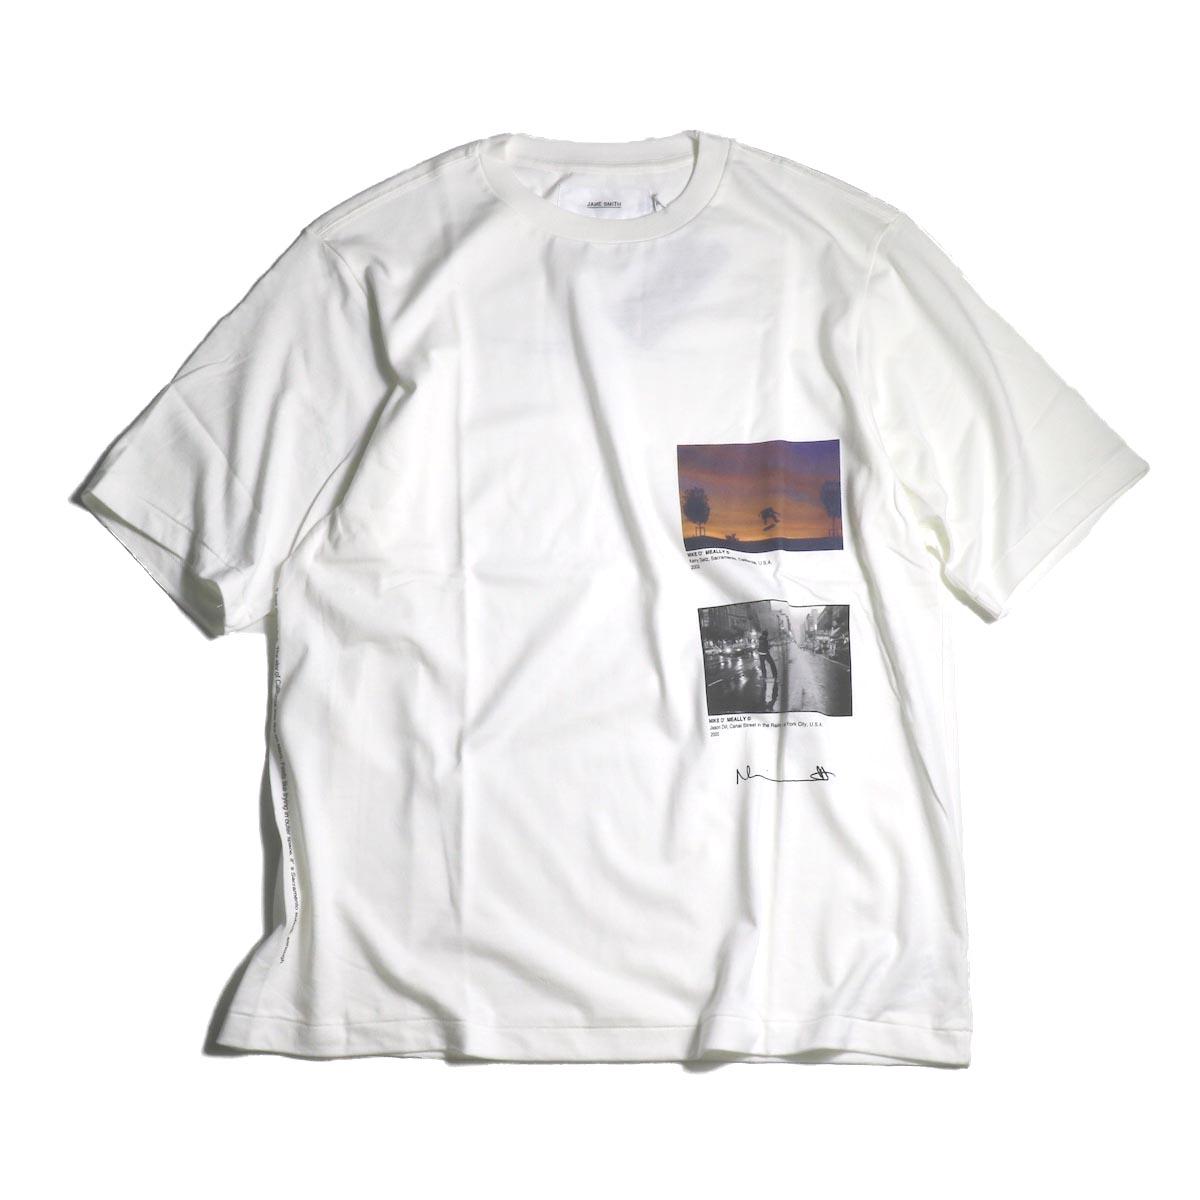 JANE SMITH / Print Tee (KERRY GETZ & JASON DULL,CANAL STREET IN THE RAIN S/S) -White